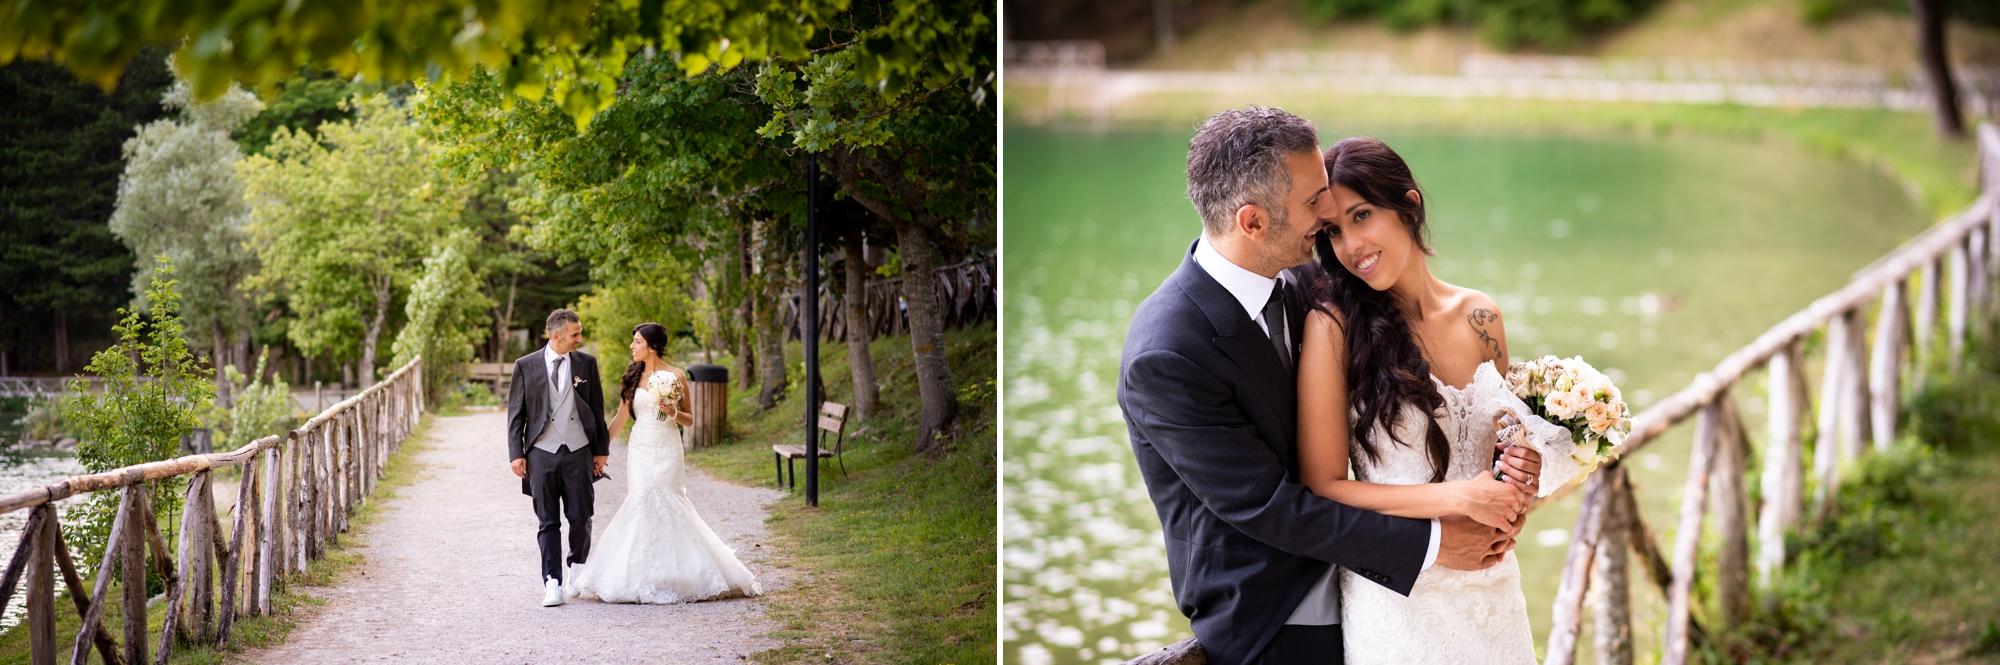 fotografa-matrimonio-rimini-michela-marco